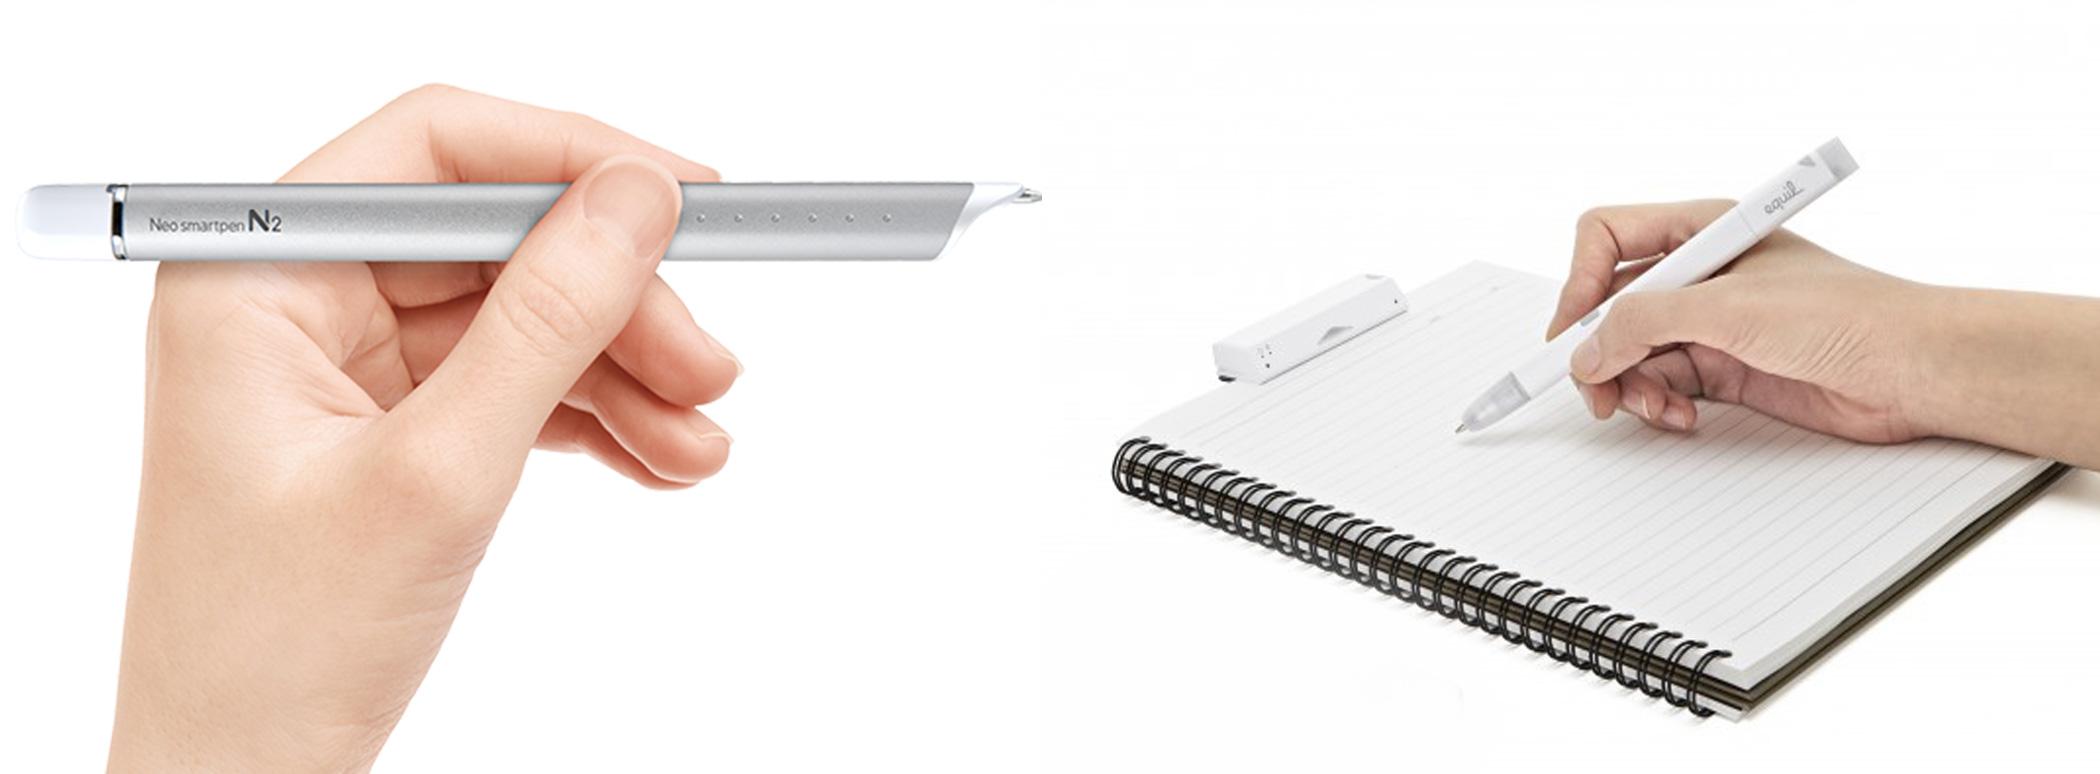 Neo Smartpen N2 vs. Equil